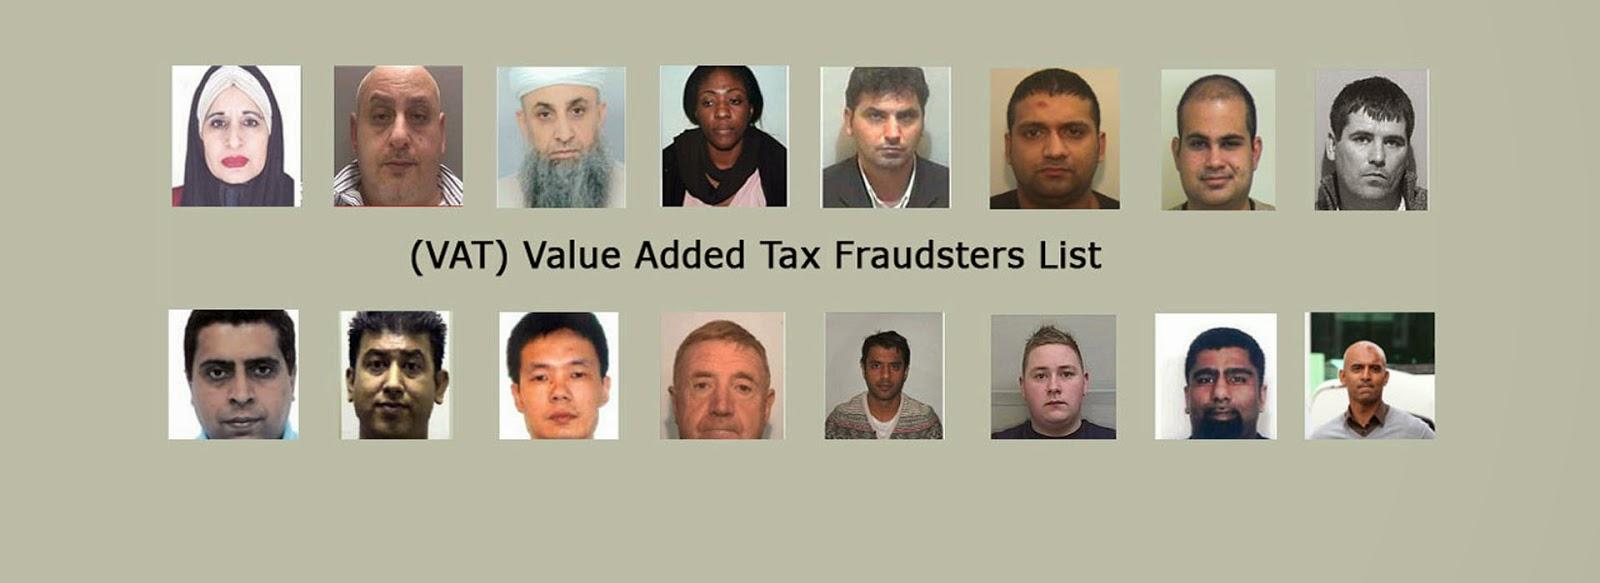 Vat Fraudsters List